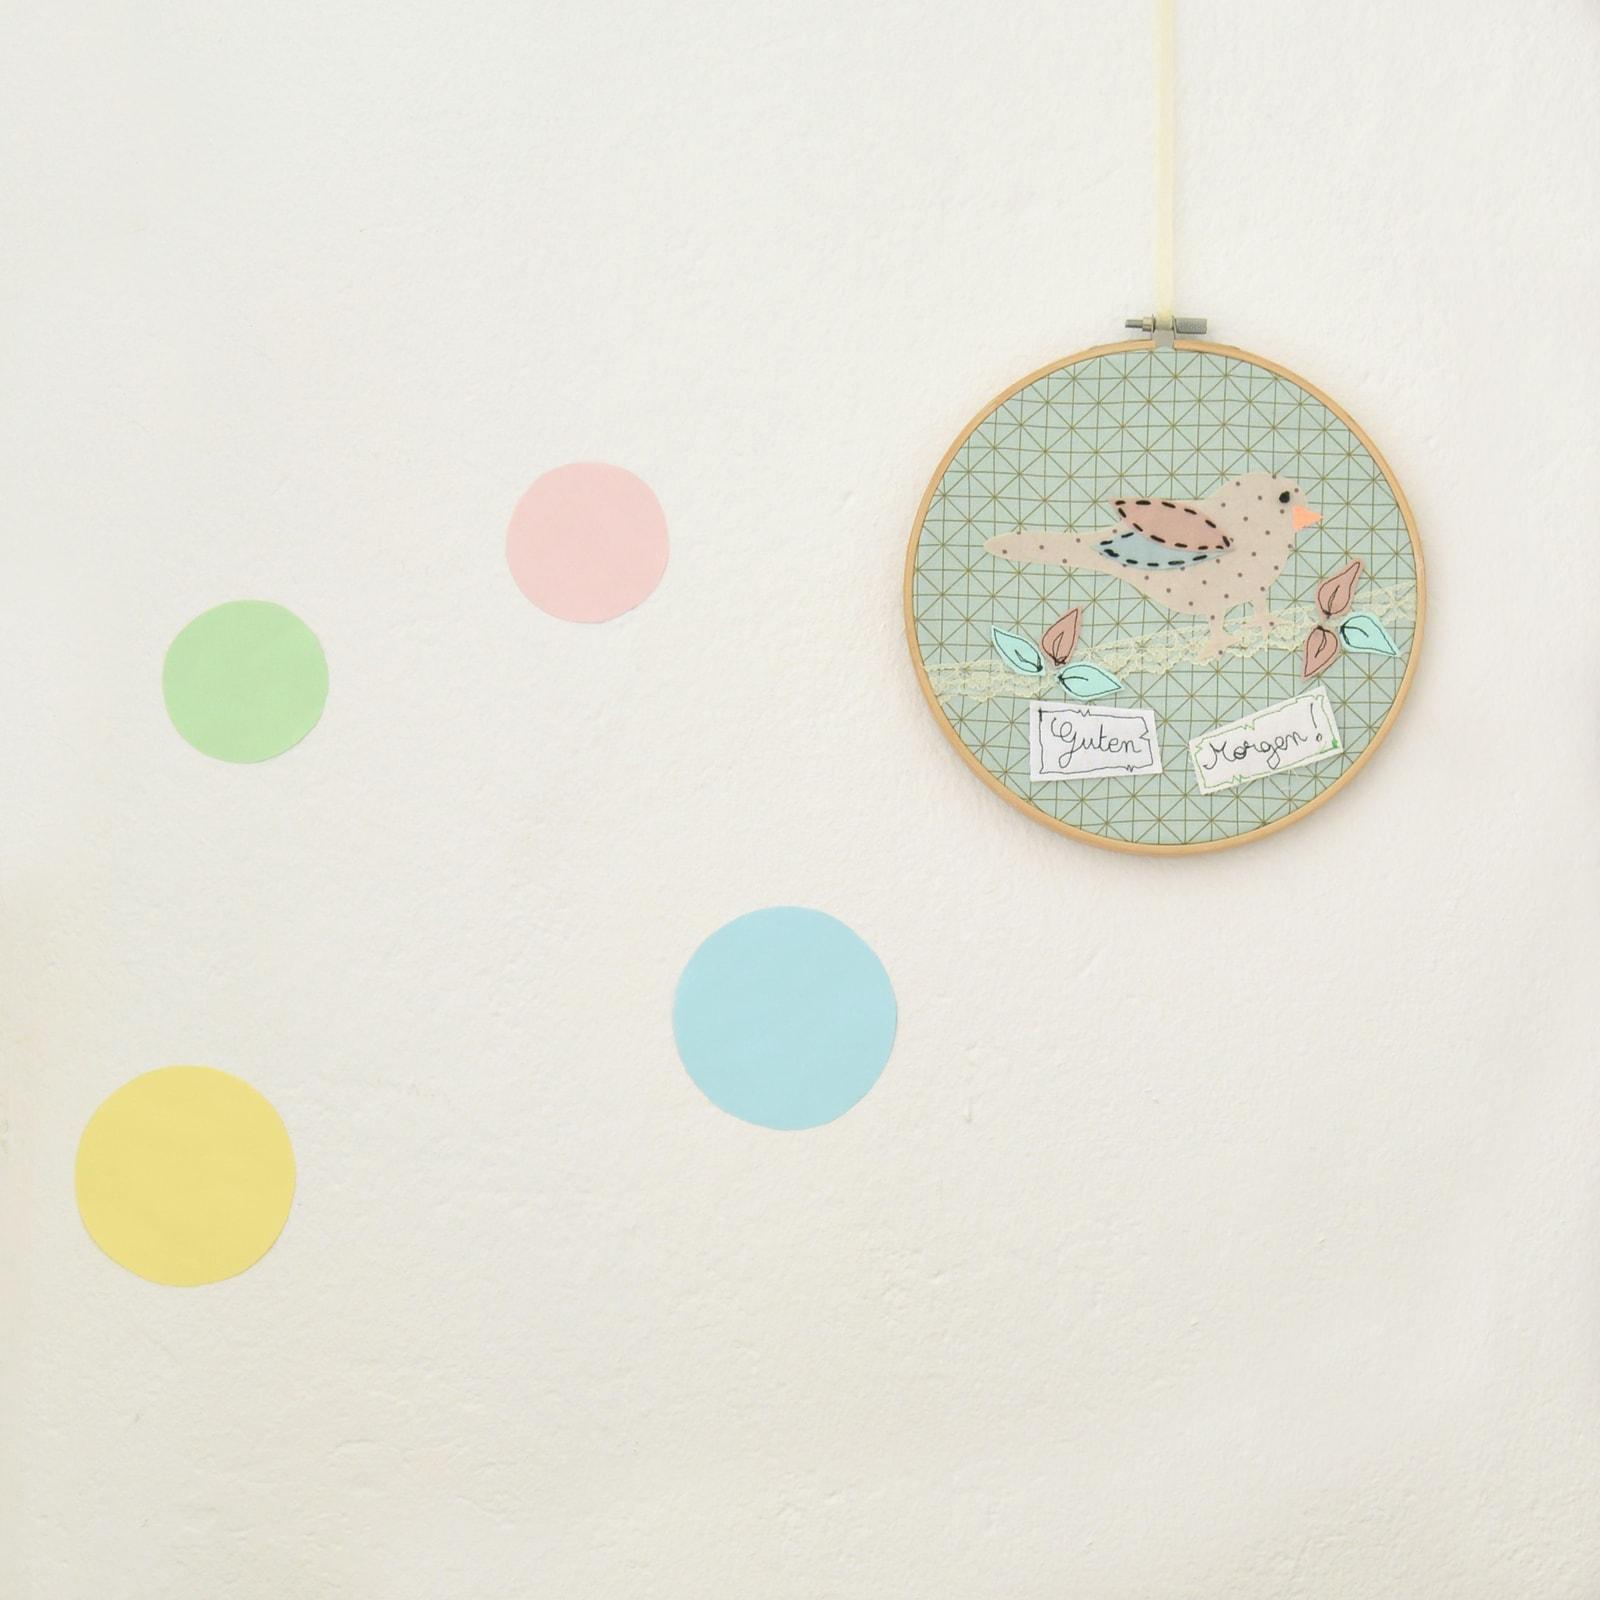 Bastelpaket | Stickrahmen | Babyzimmer-Deko | ilma pallo | DIY-Kits ...